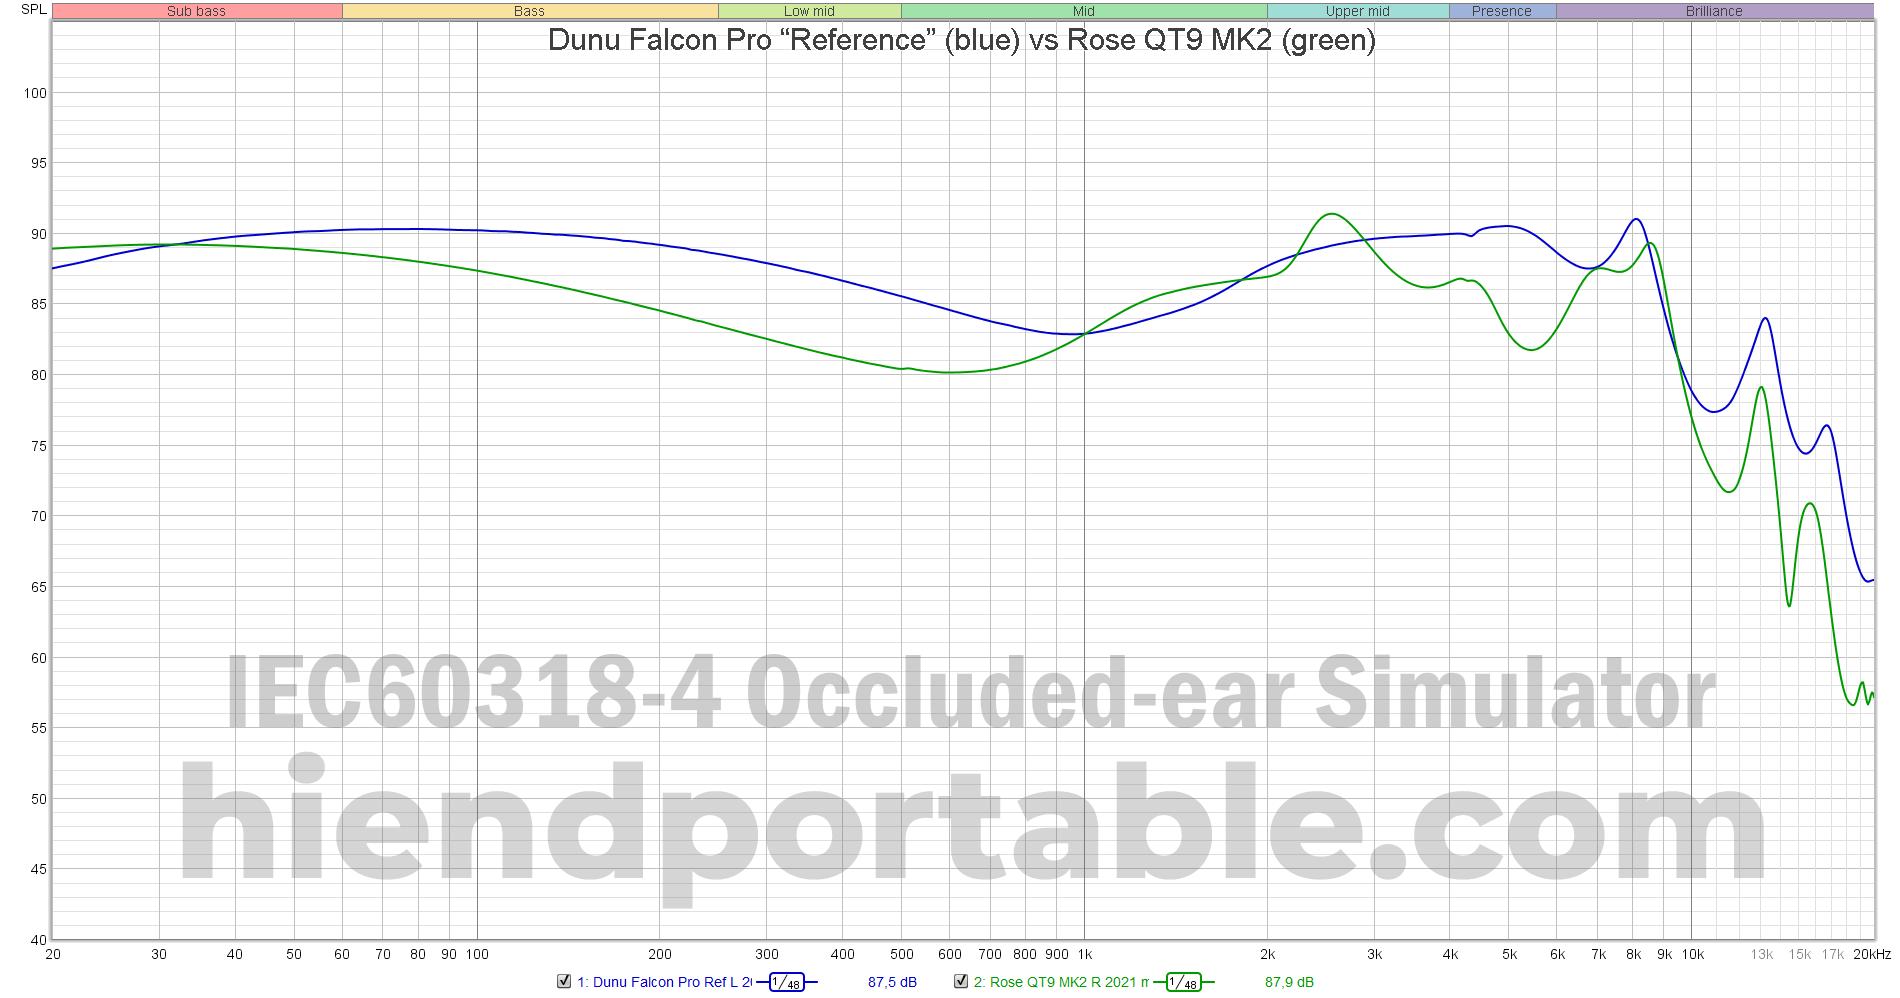 Dunu-Falcon-Pro-Reference-vs-Rose-QT9-MK2.png